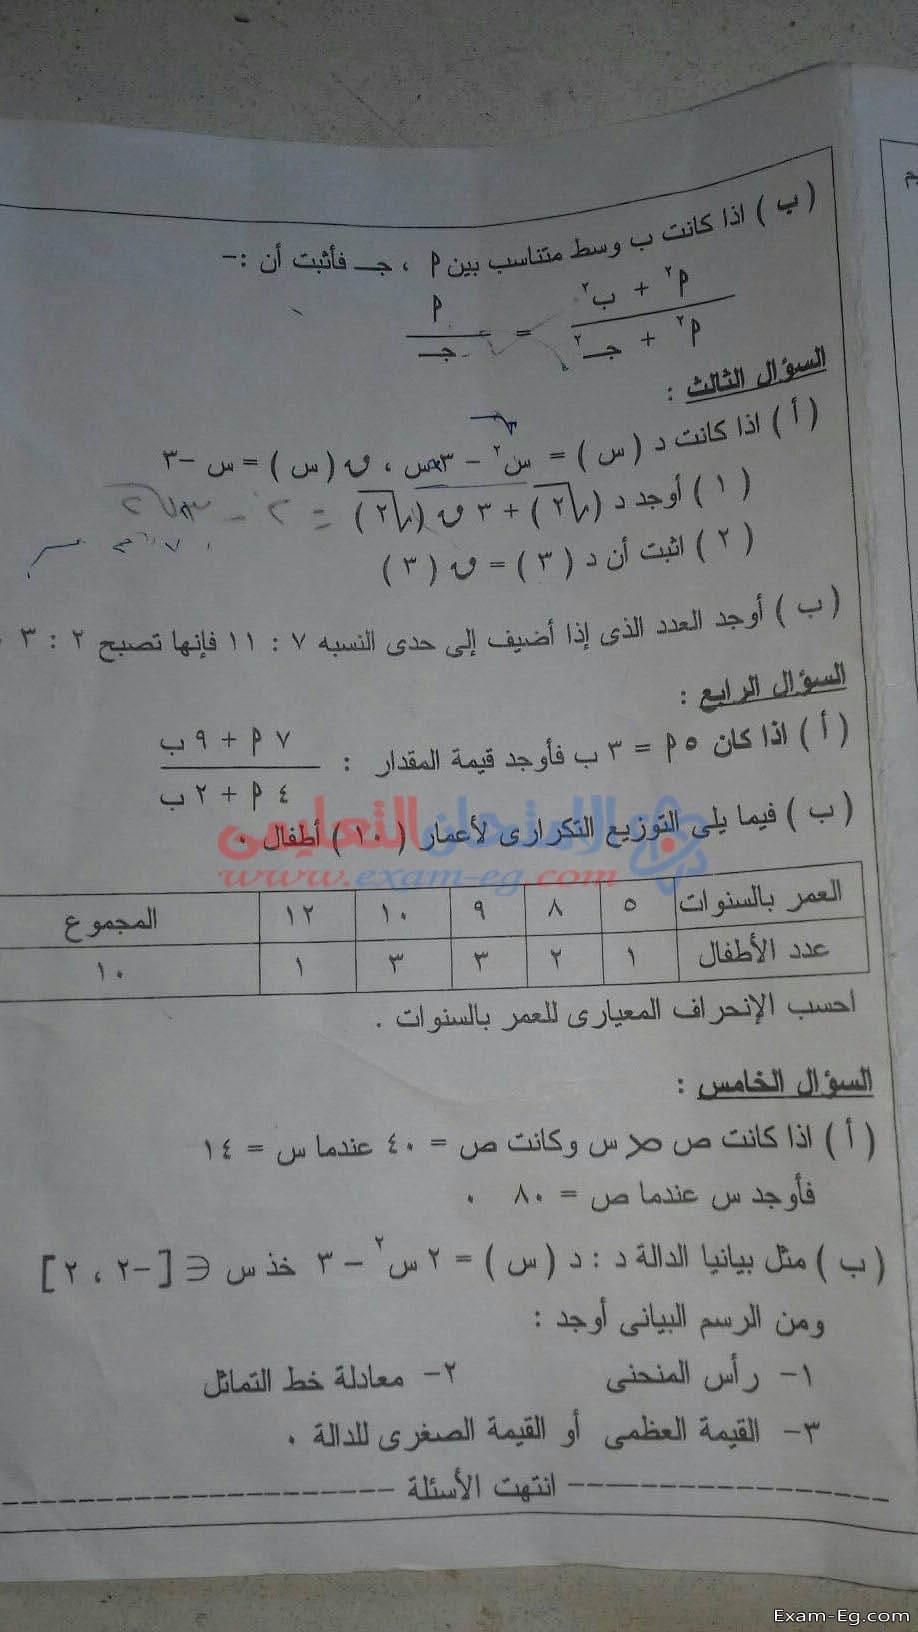 exam-eg.com_1548300100966.jpg